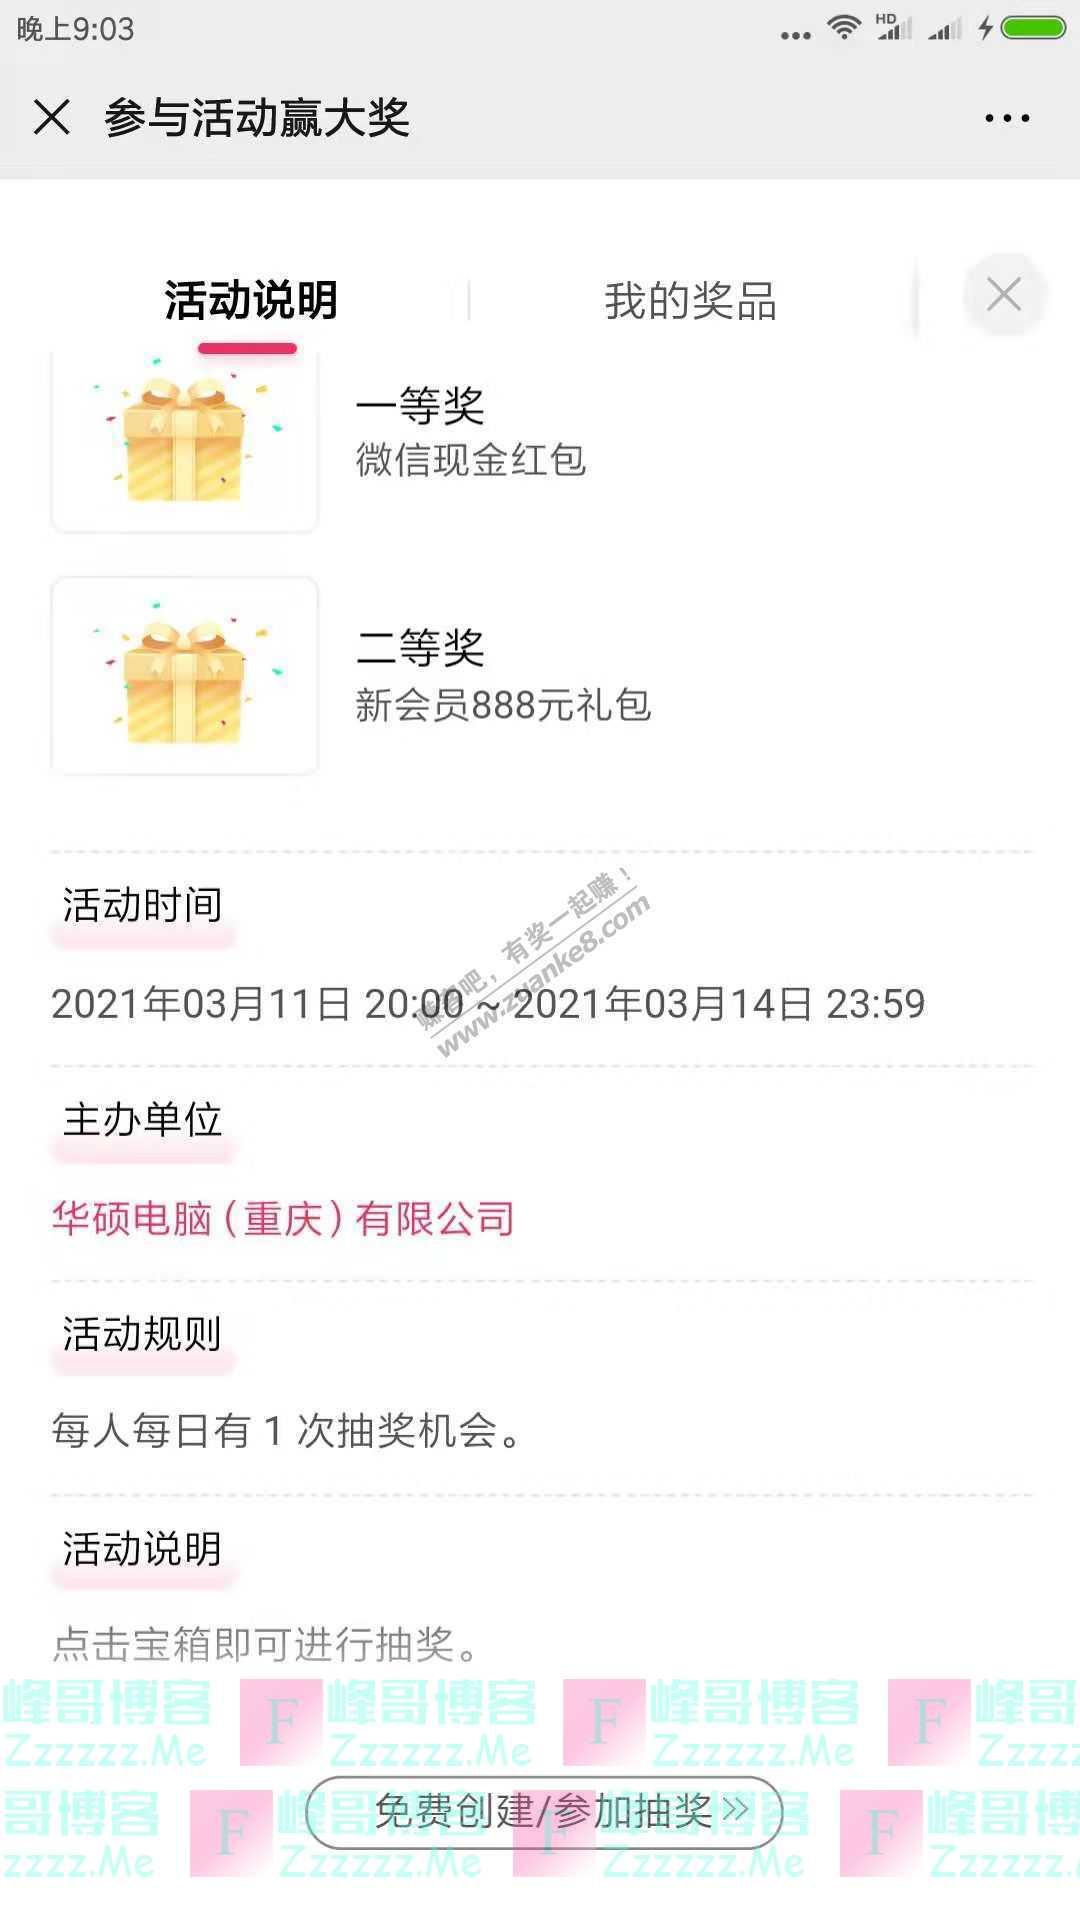 ASUS华硕重庆重磅新品 | 腾讯ROG游戏手机5震撼发布(截止3月14日)